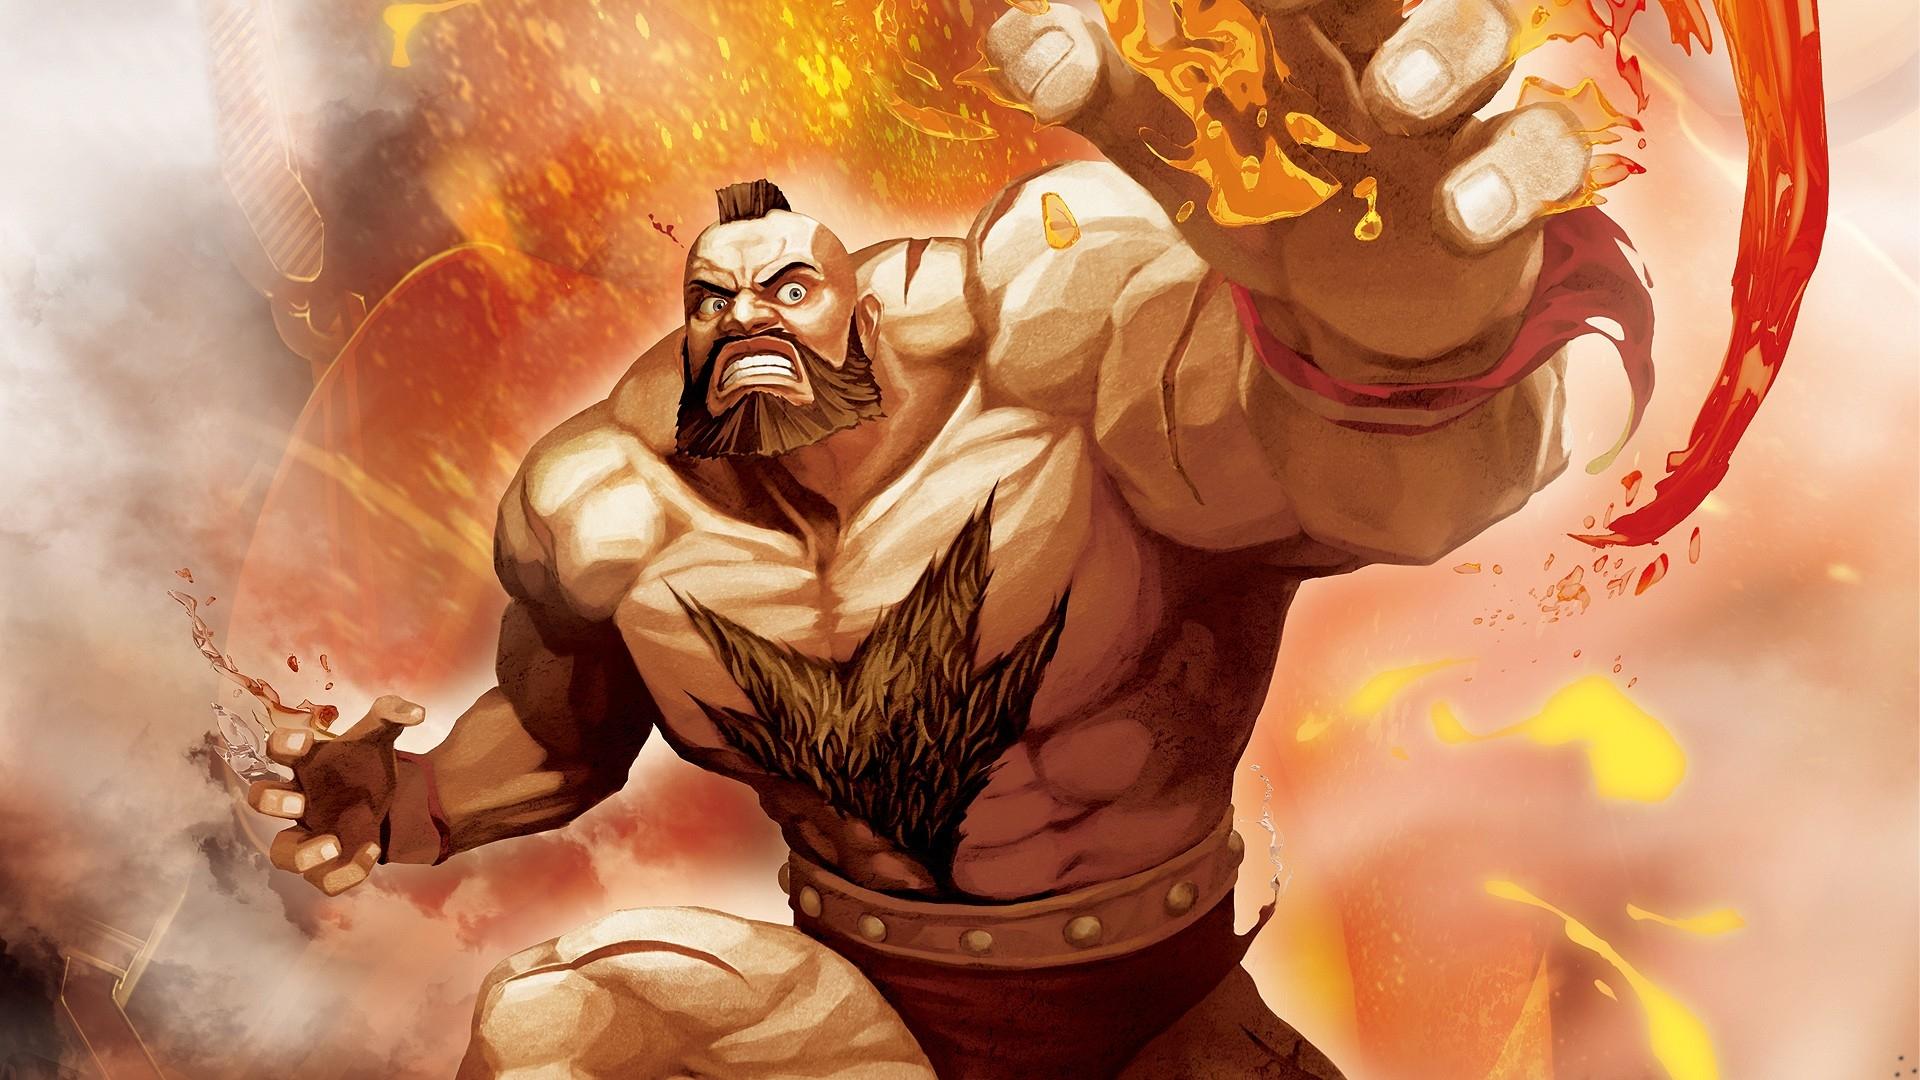 Wallpaper Street Fighter X Tekken Zangief Fighter Hands